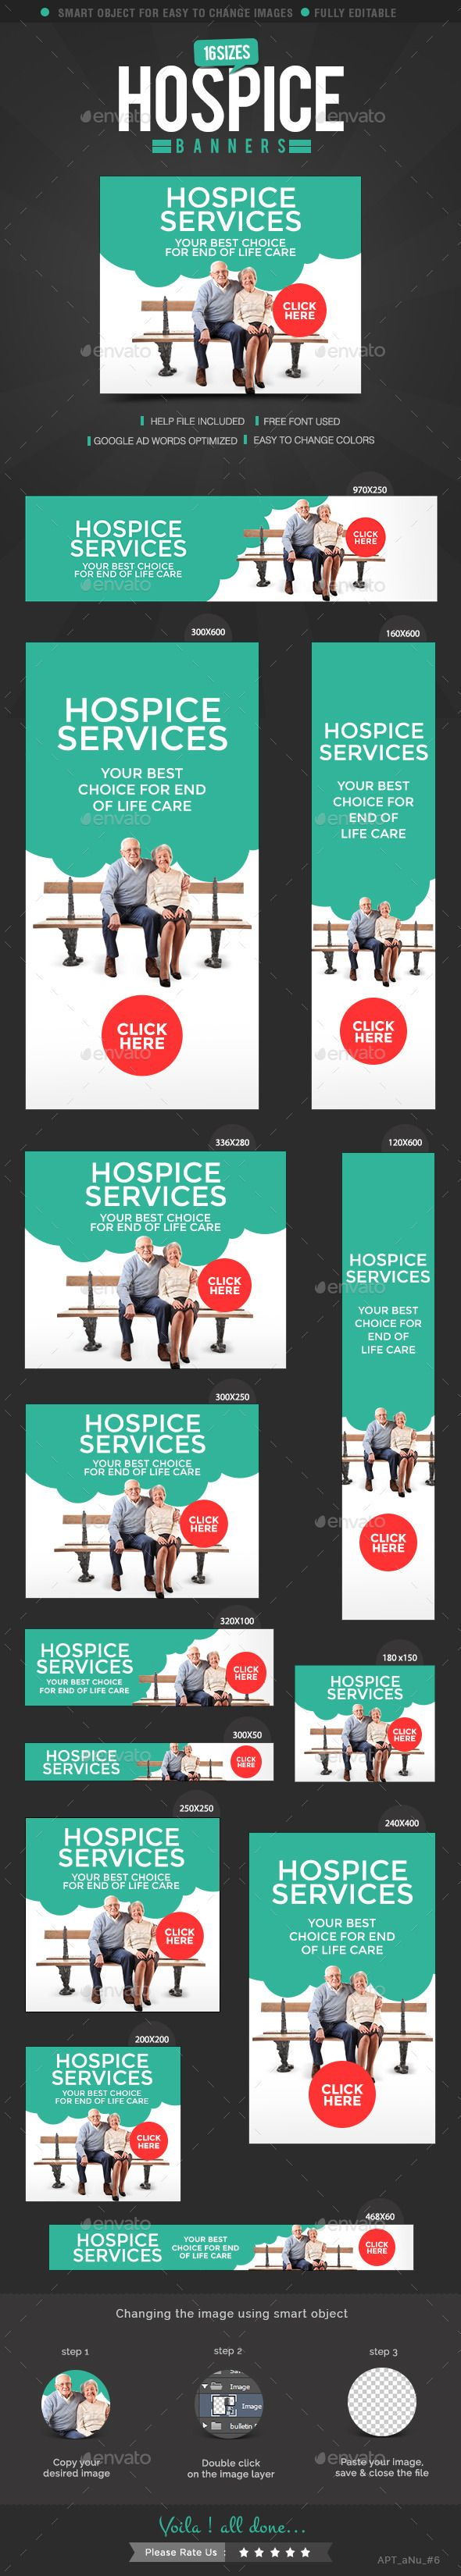 Poster design job description - Hospice Care Web Banner Design Set